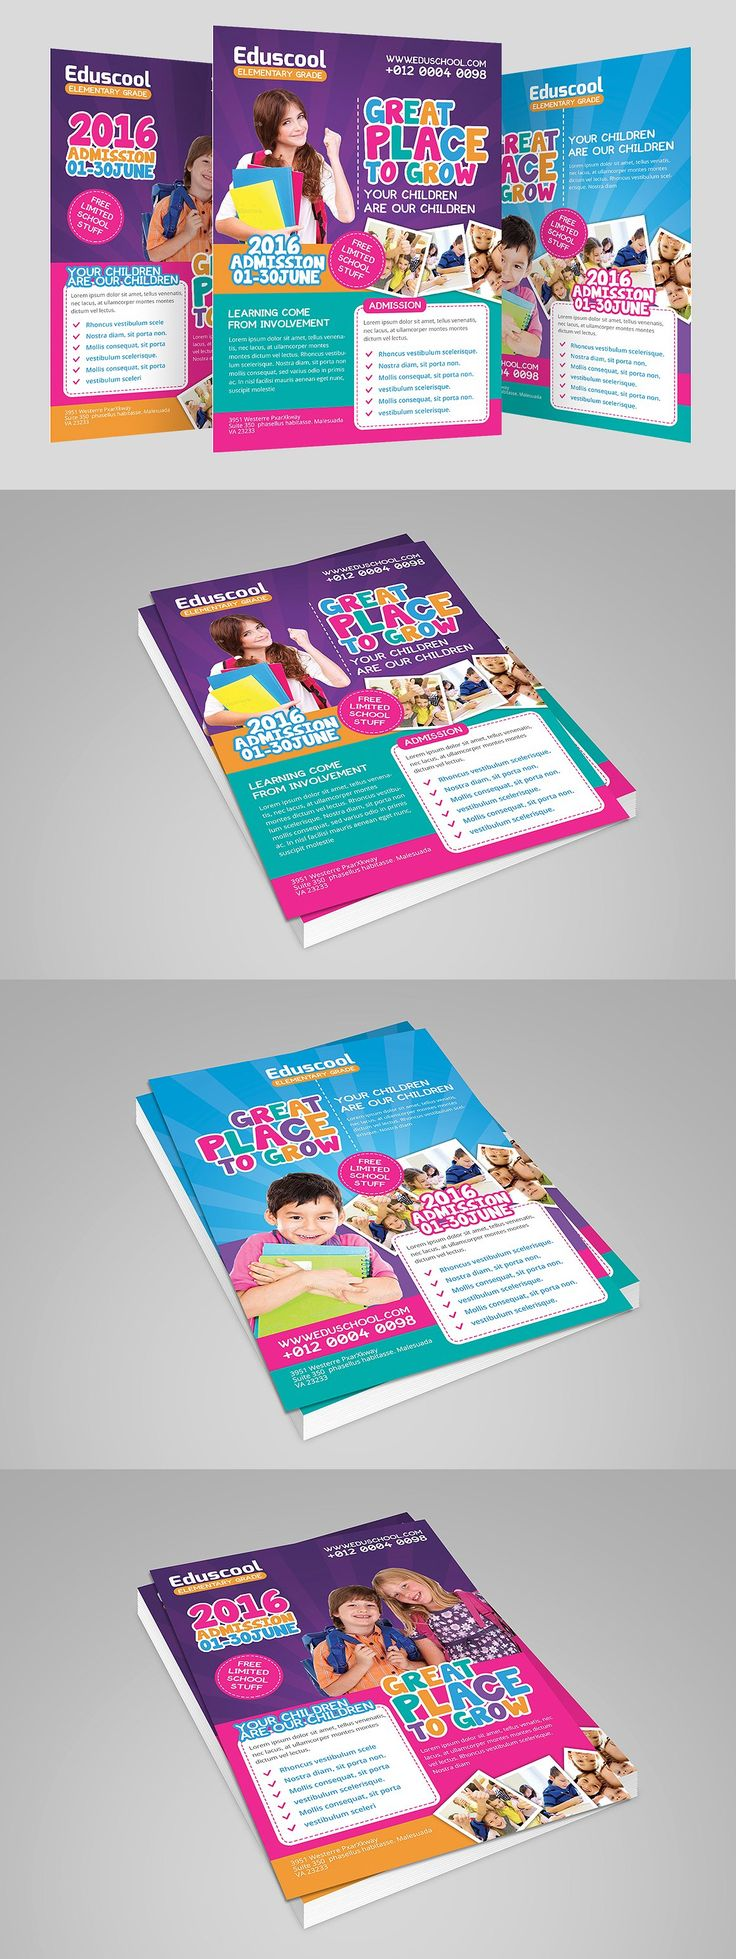 Elementary School Promotion Flyer Templates PSD